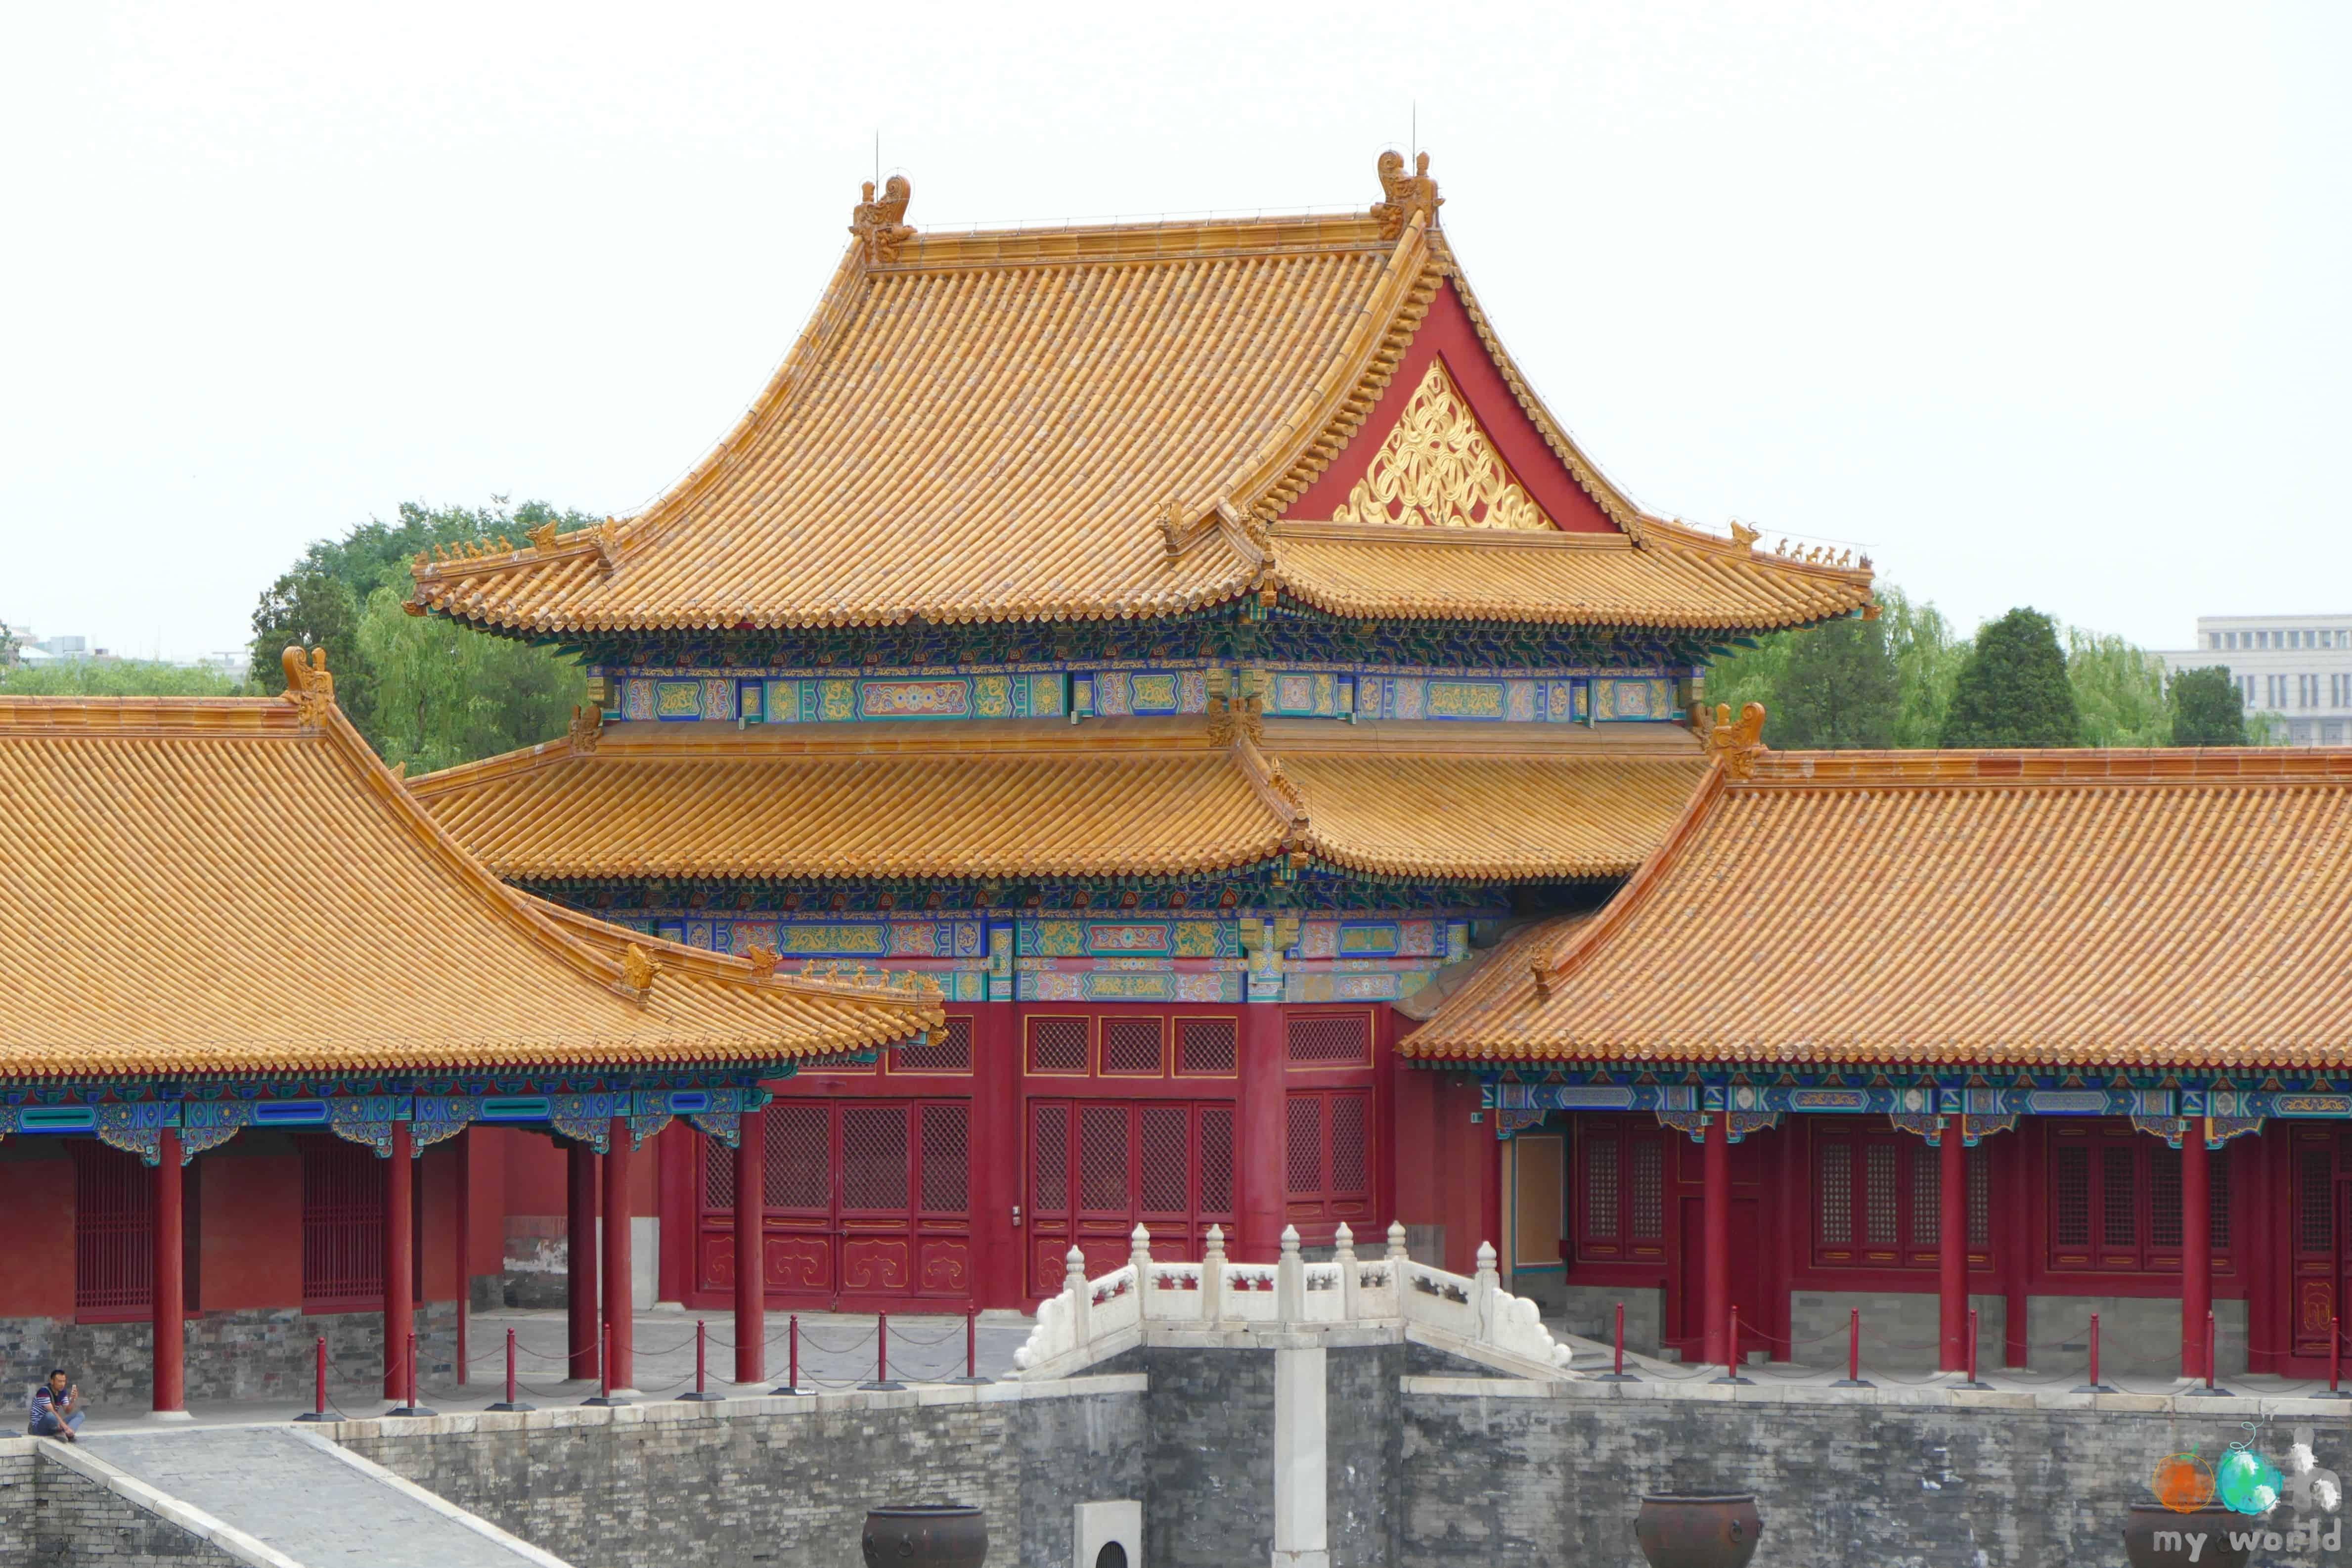 Cité interdite de Pékin en Chine